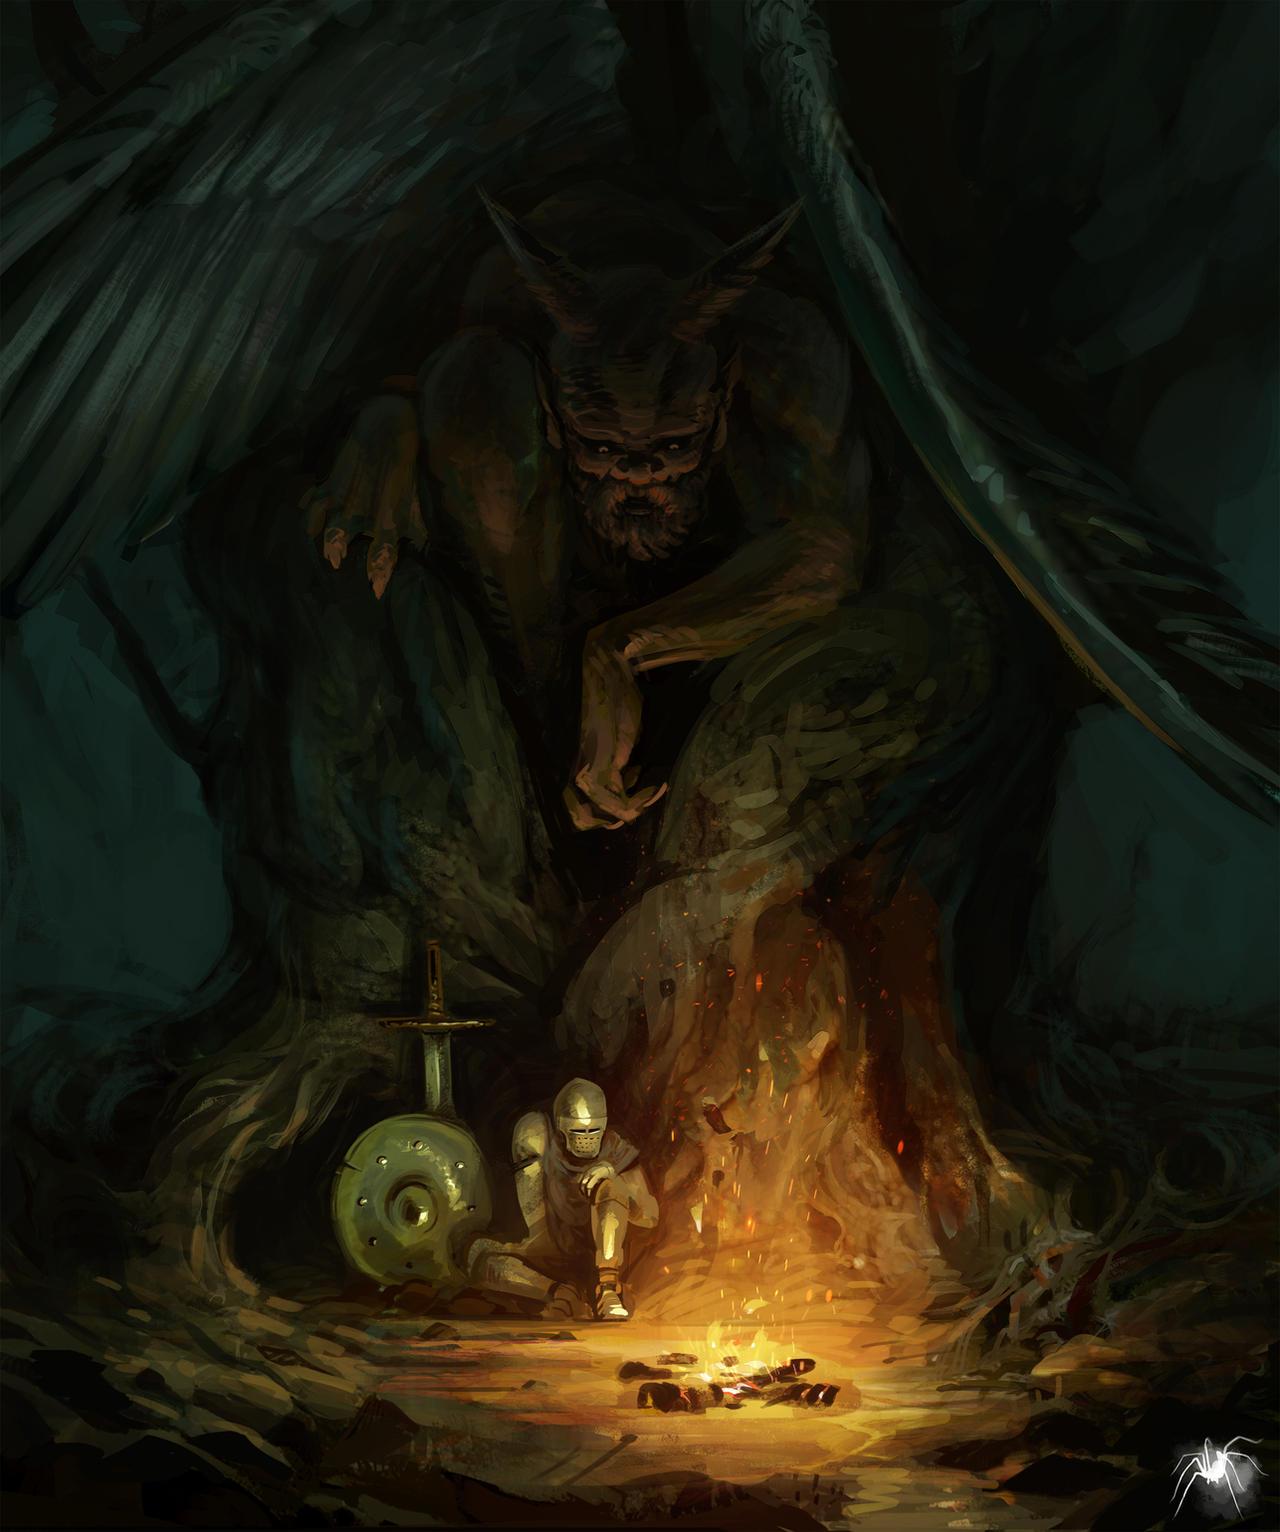 The willow devil by Reicheran